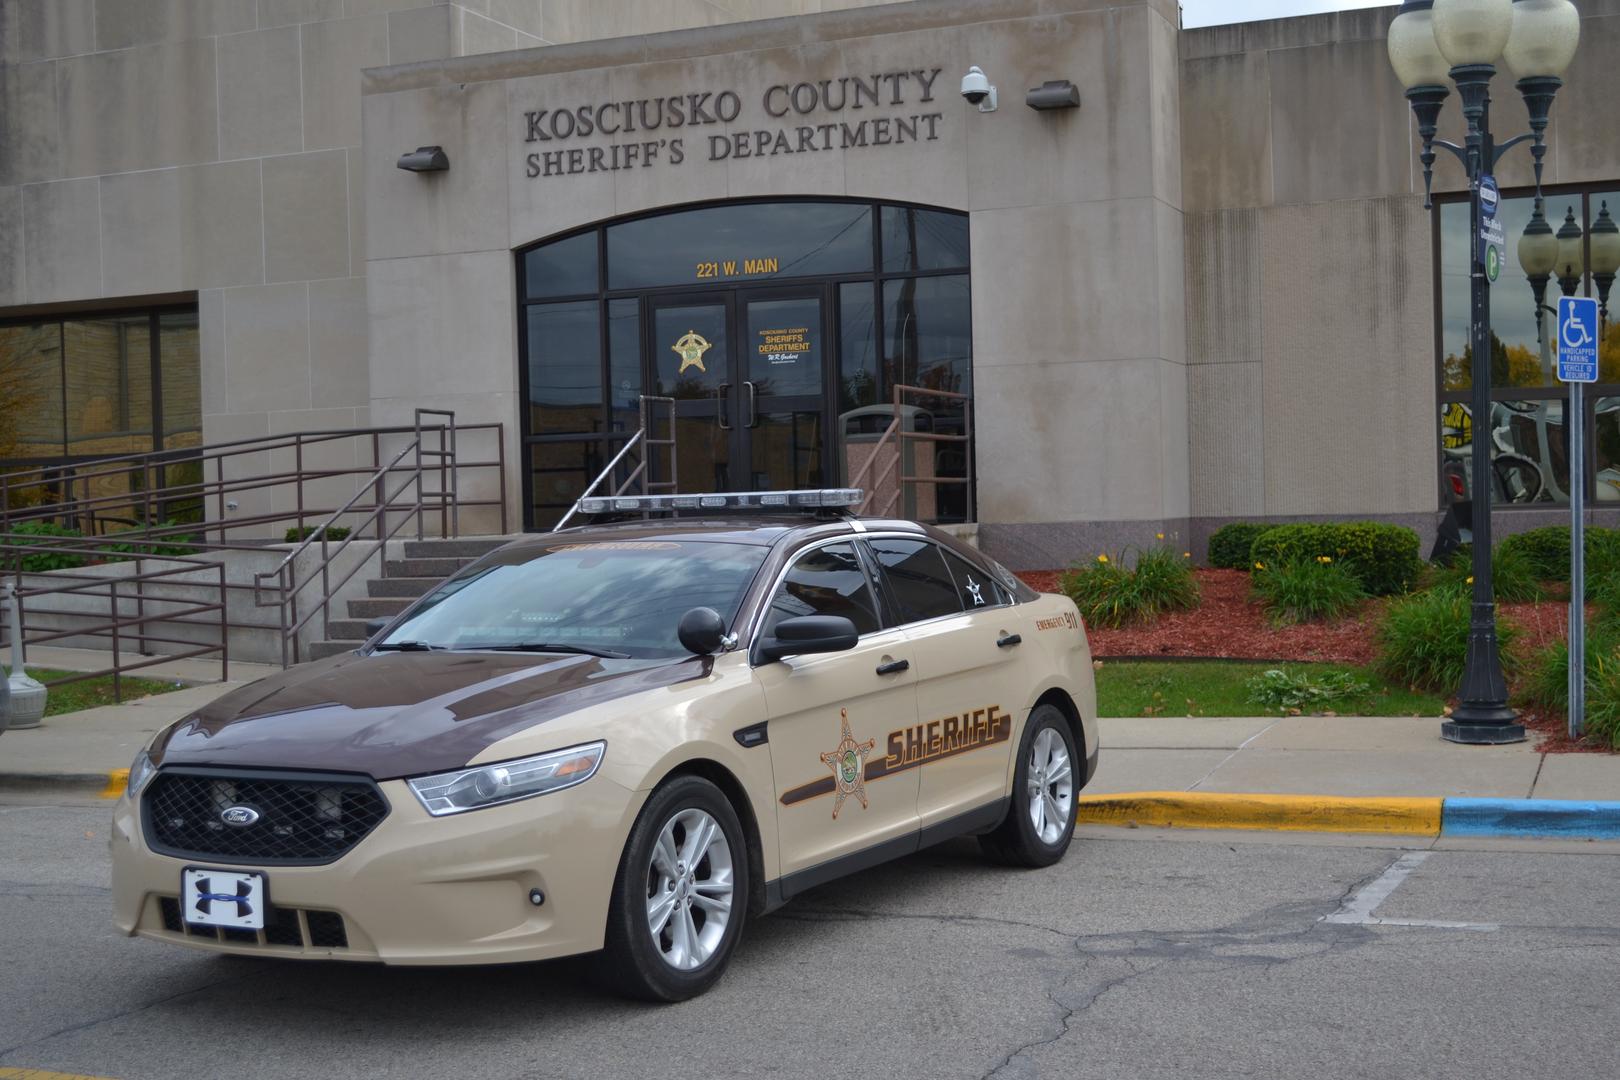 Indiana kosciusko county syracuse - Indiana Sex Offender